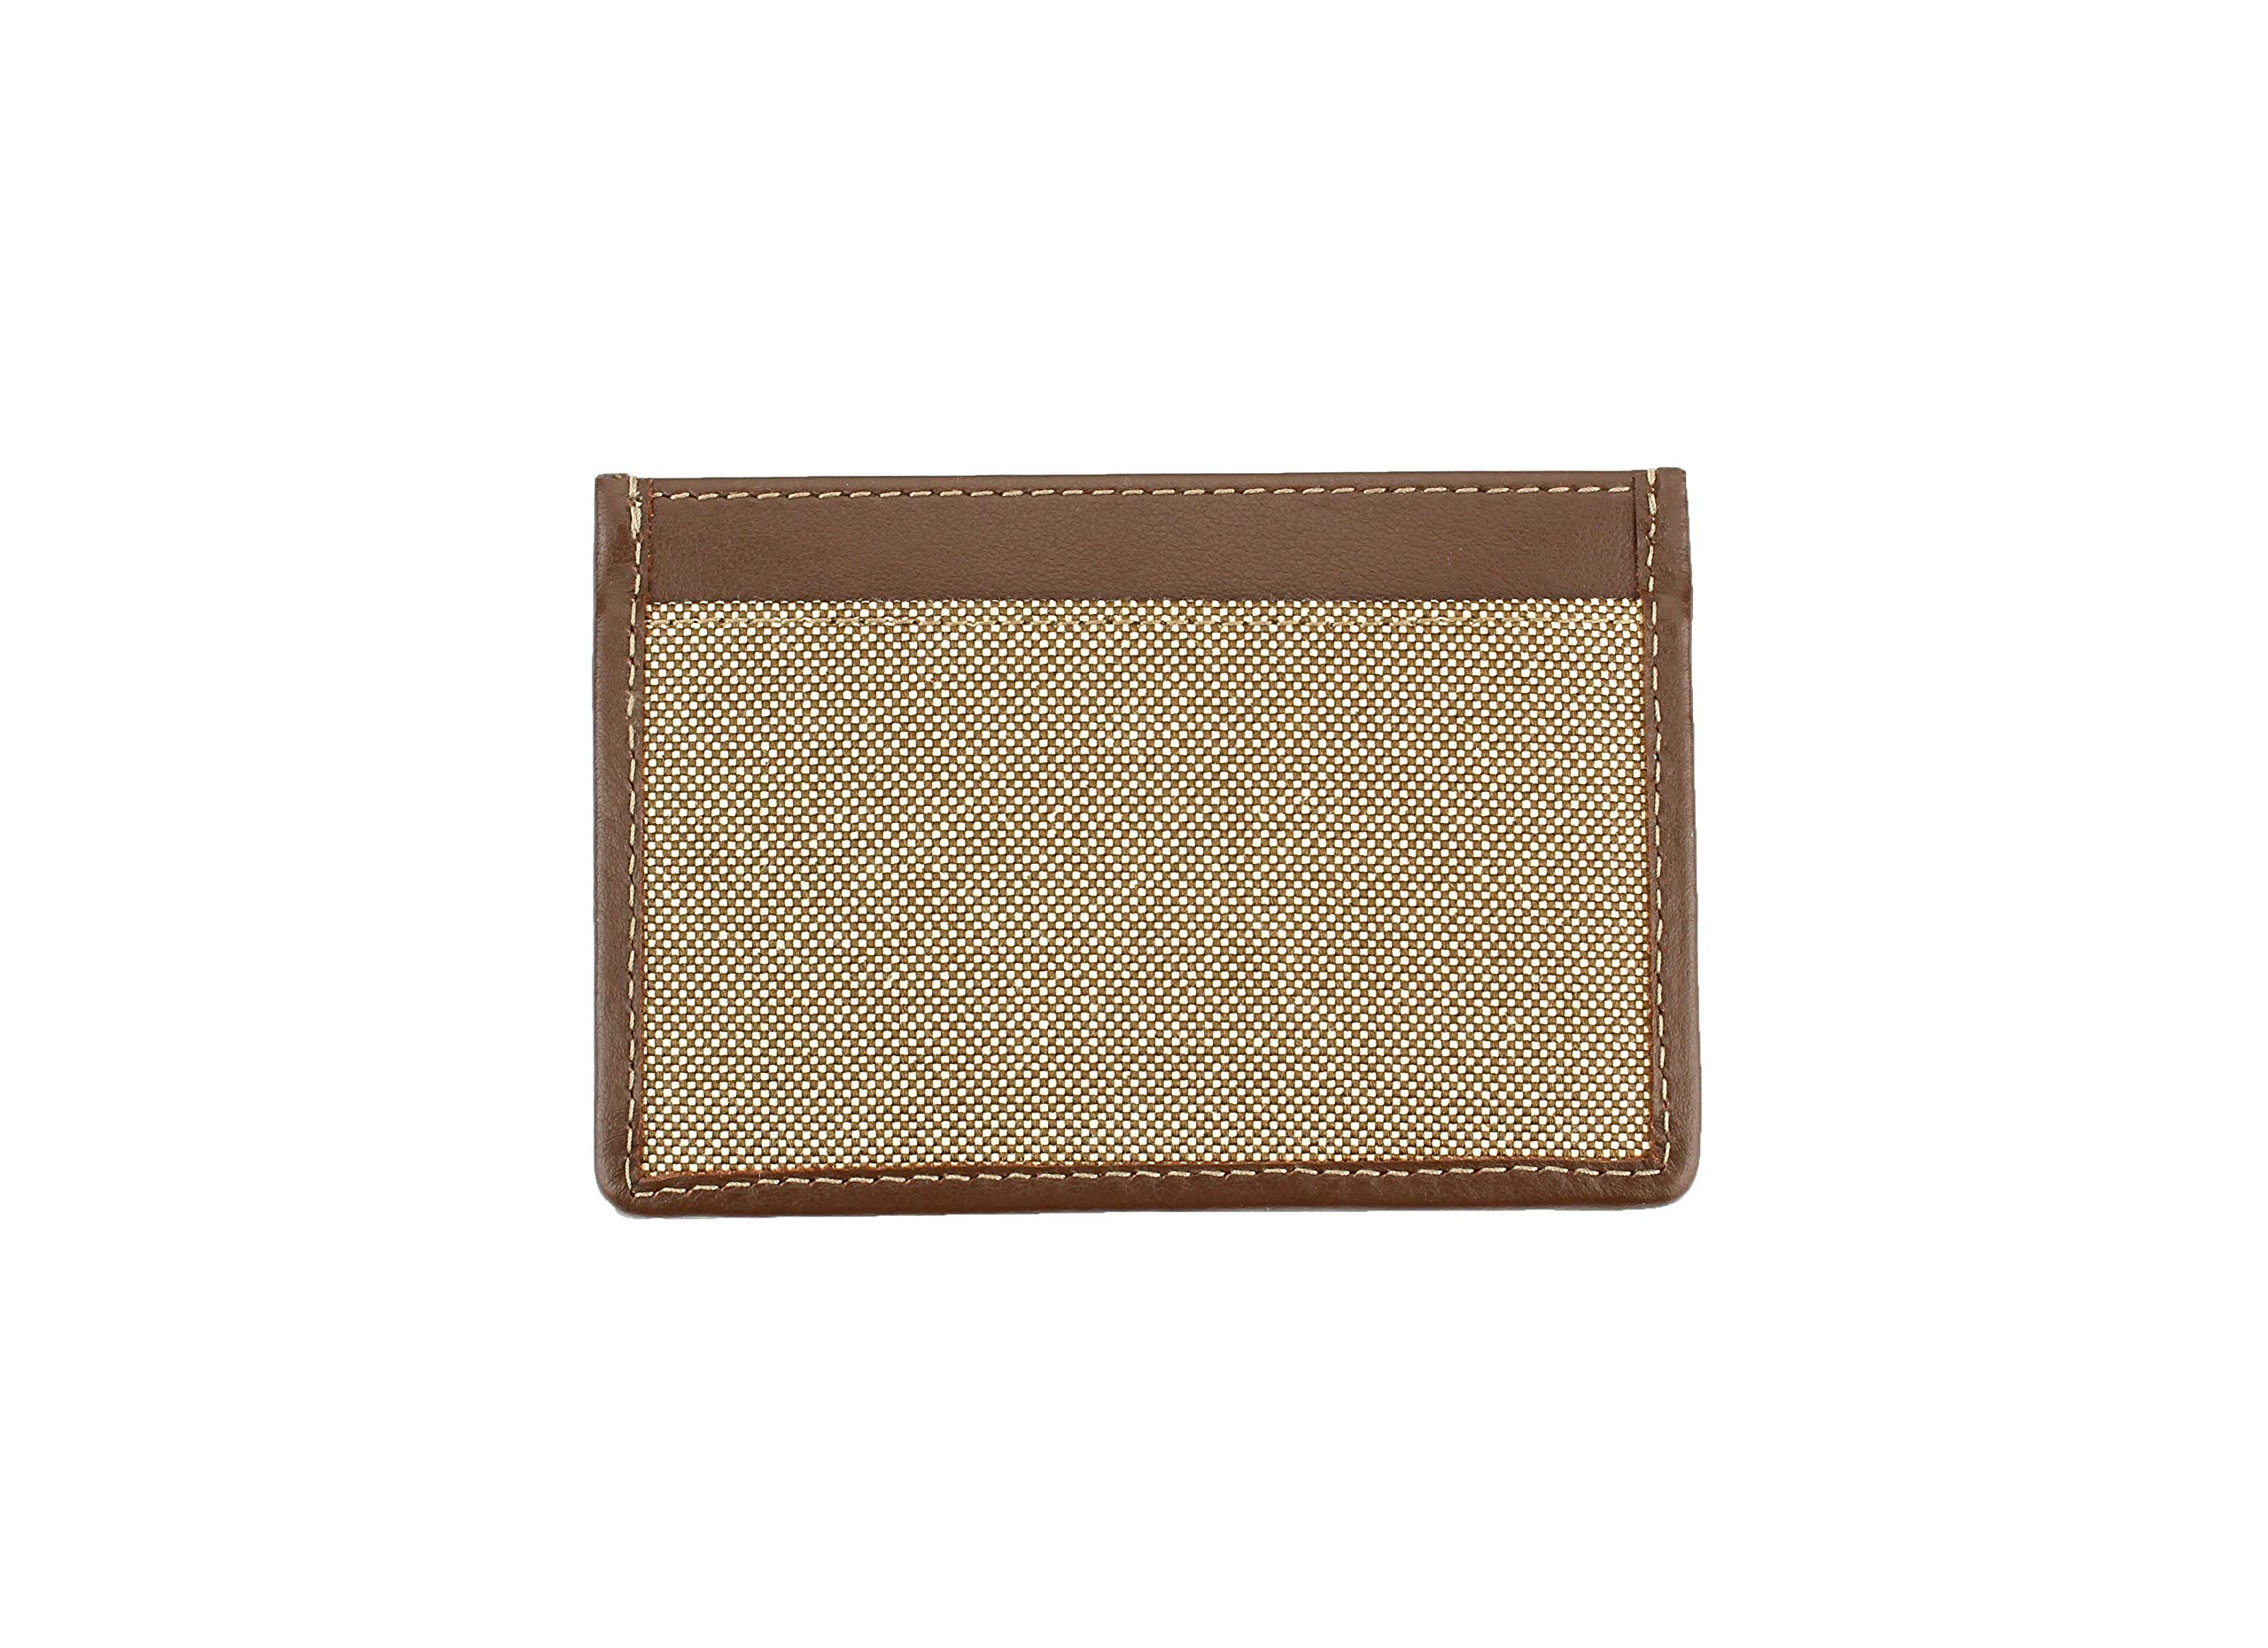 Prada Corda Canvas Logo Plaque Card Case Holder, Brown/beige by Prada (Image #2)